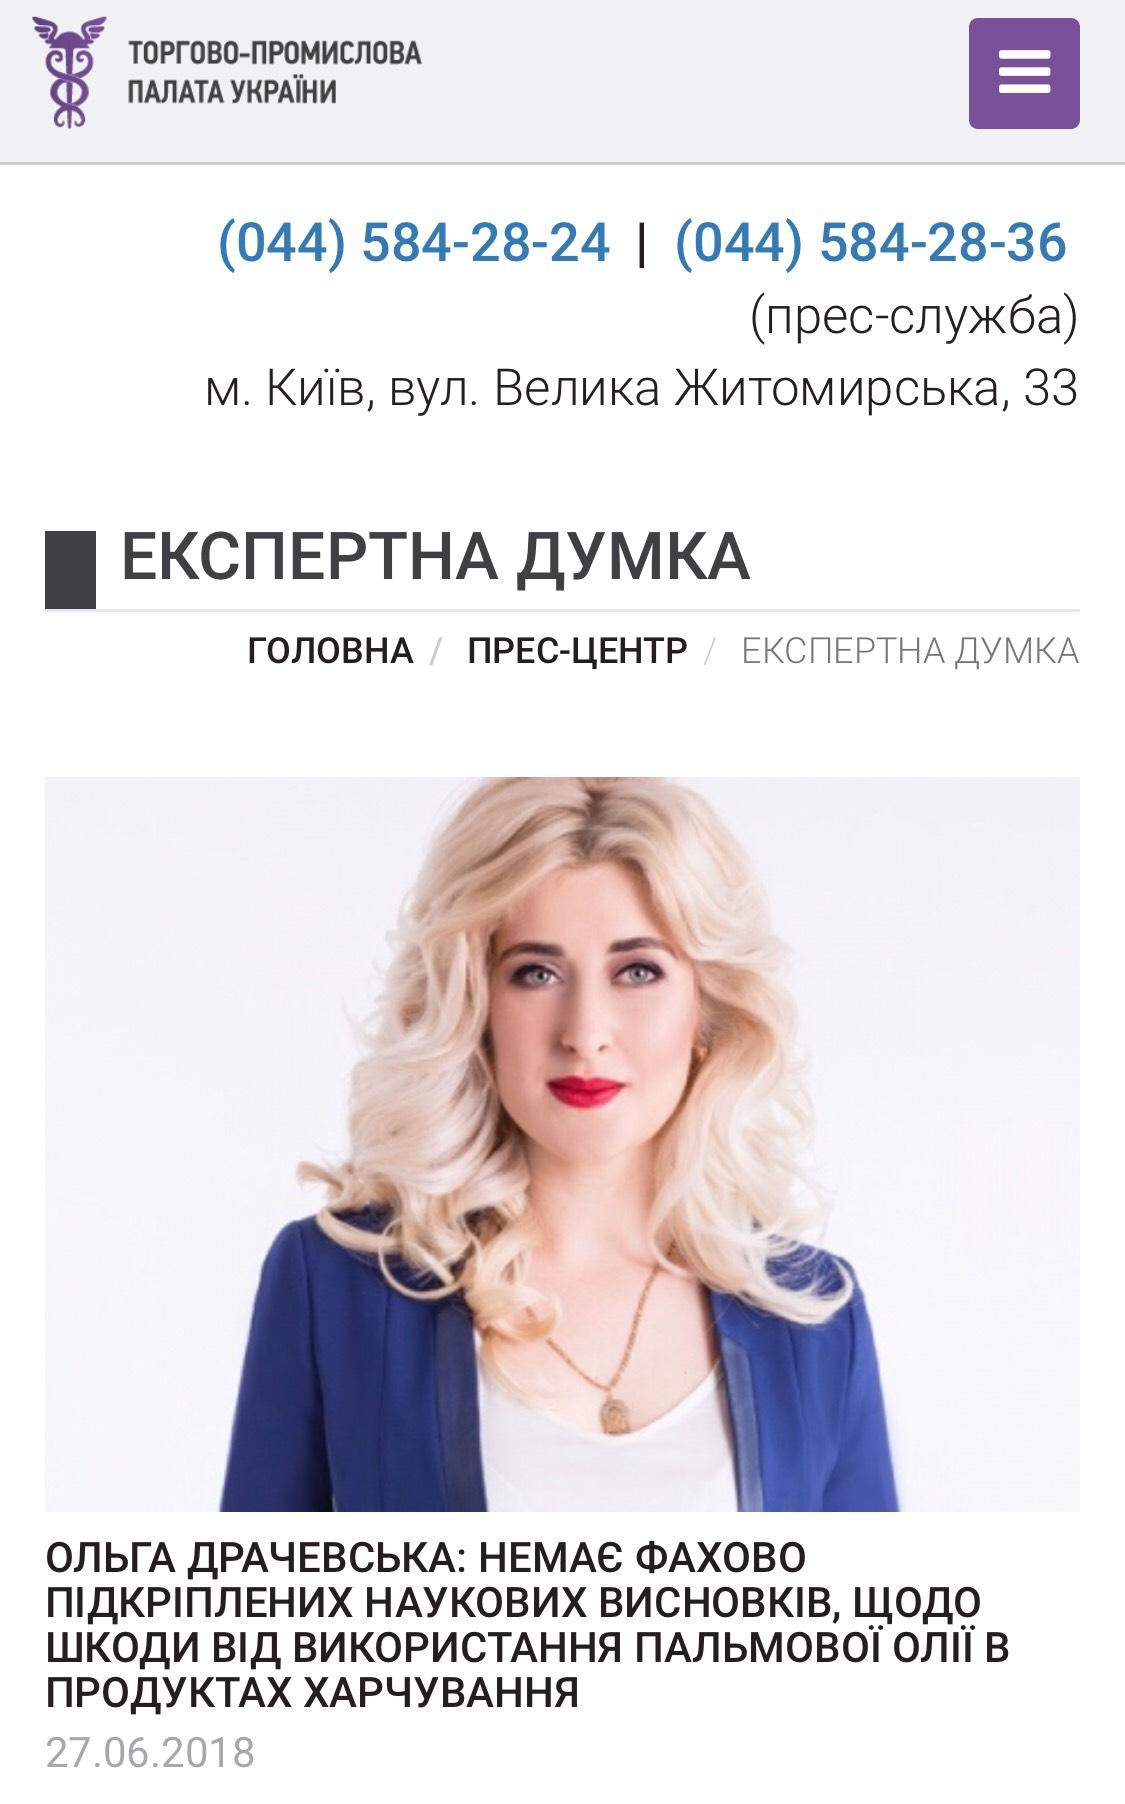 Драчевска Ольга, Drachevska Olga